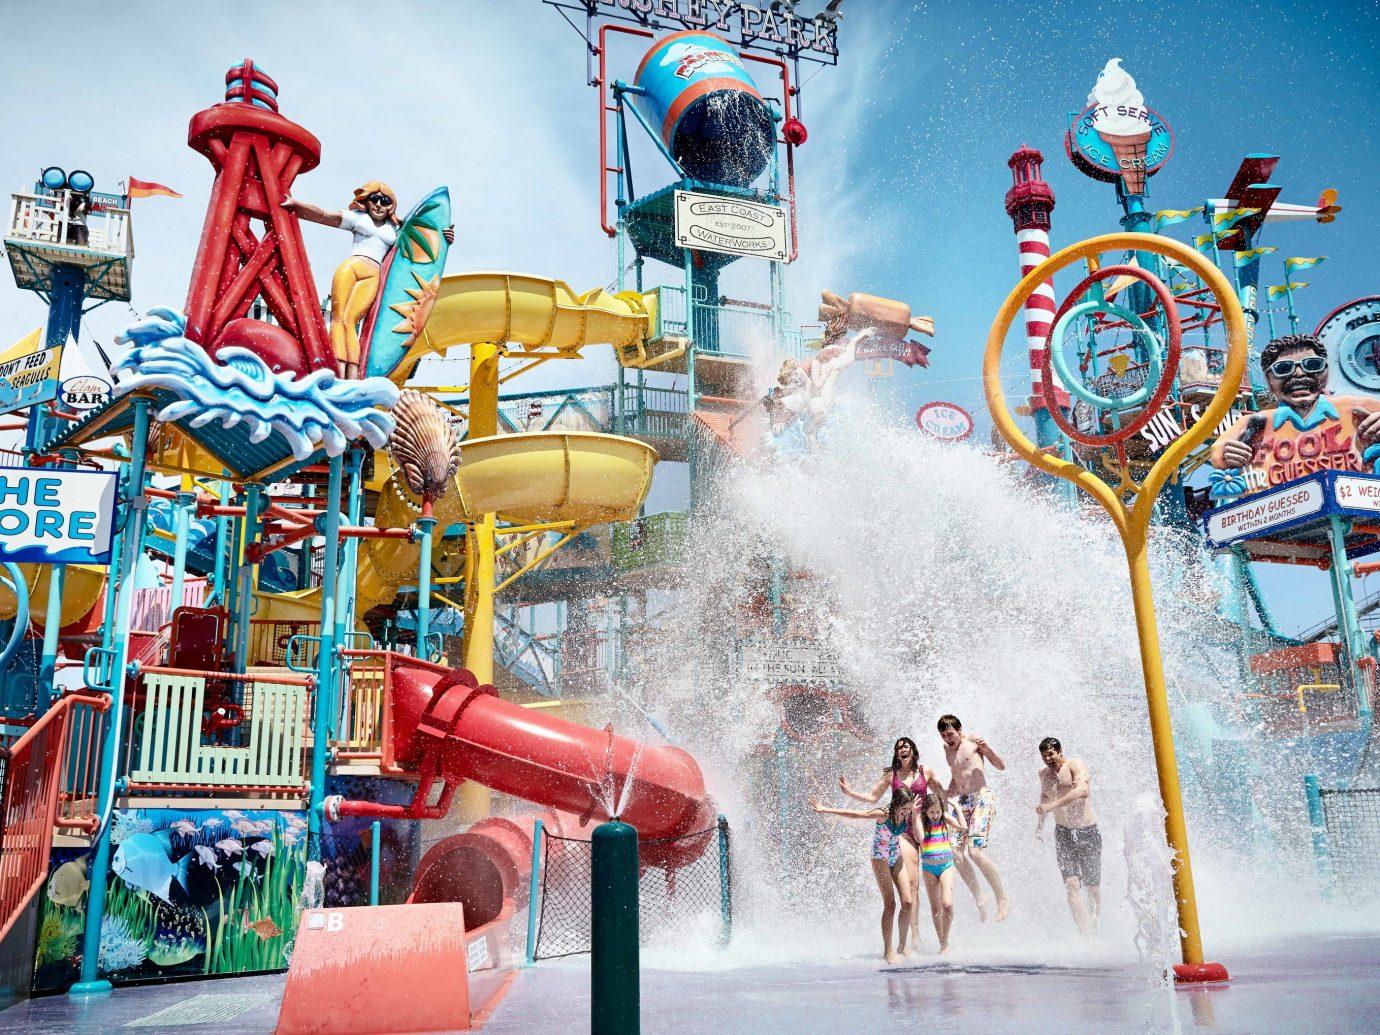 Trip Ideas Weekend Getaways amusement park park amusement ride Water park outdoor recreation transport recreation illustration nonbuilding structure decorated